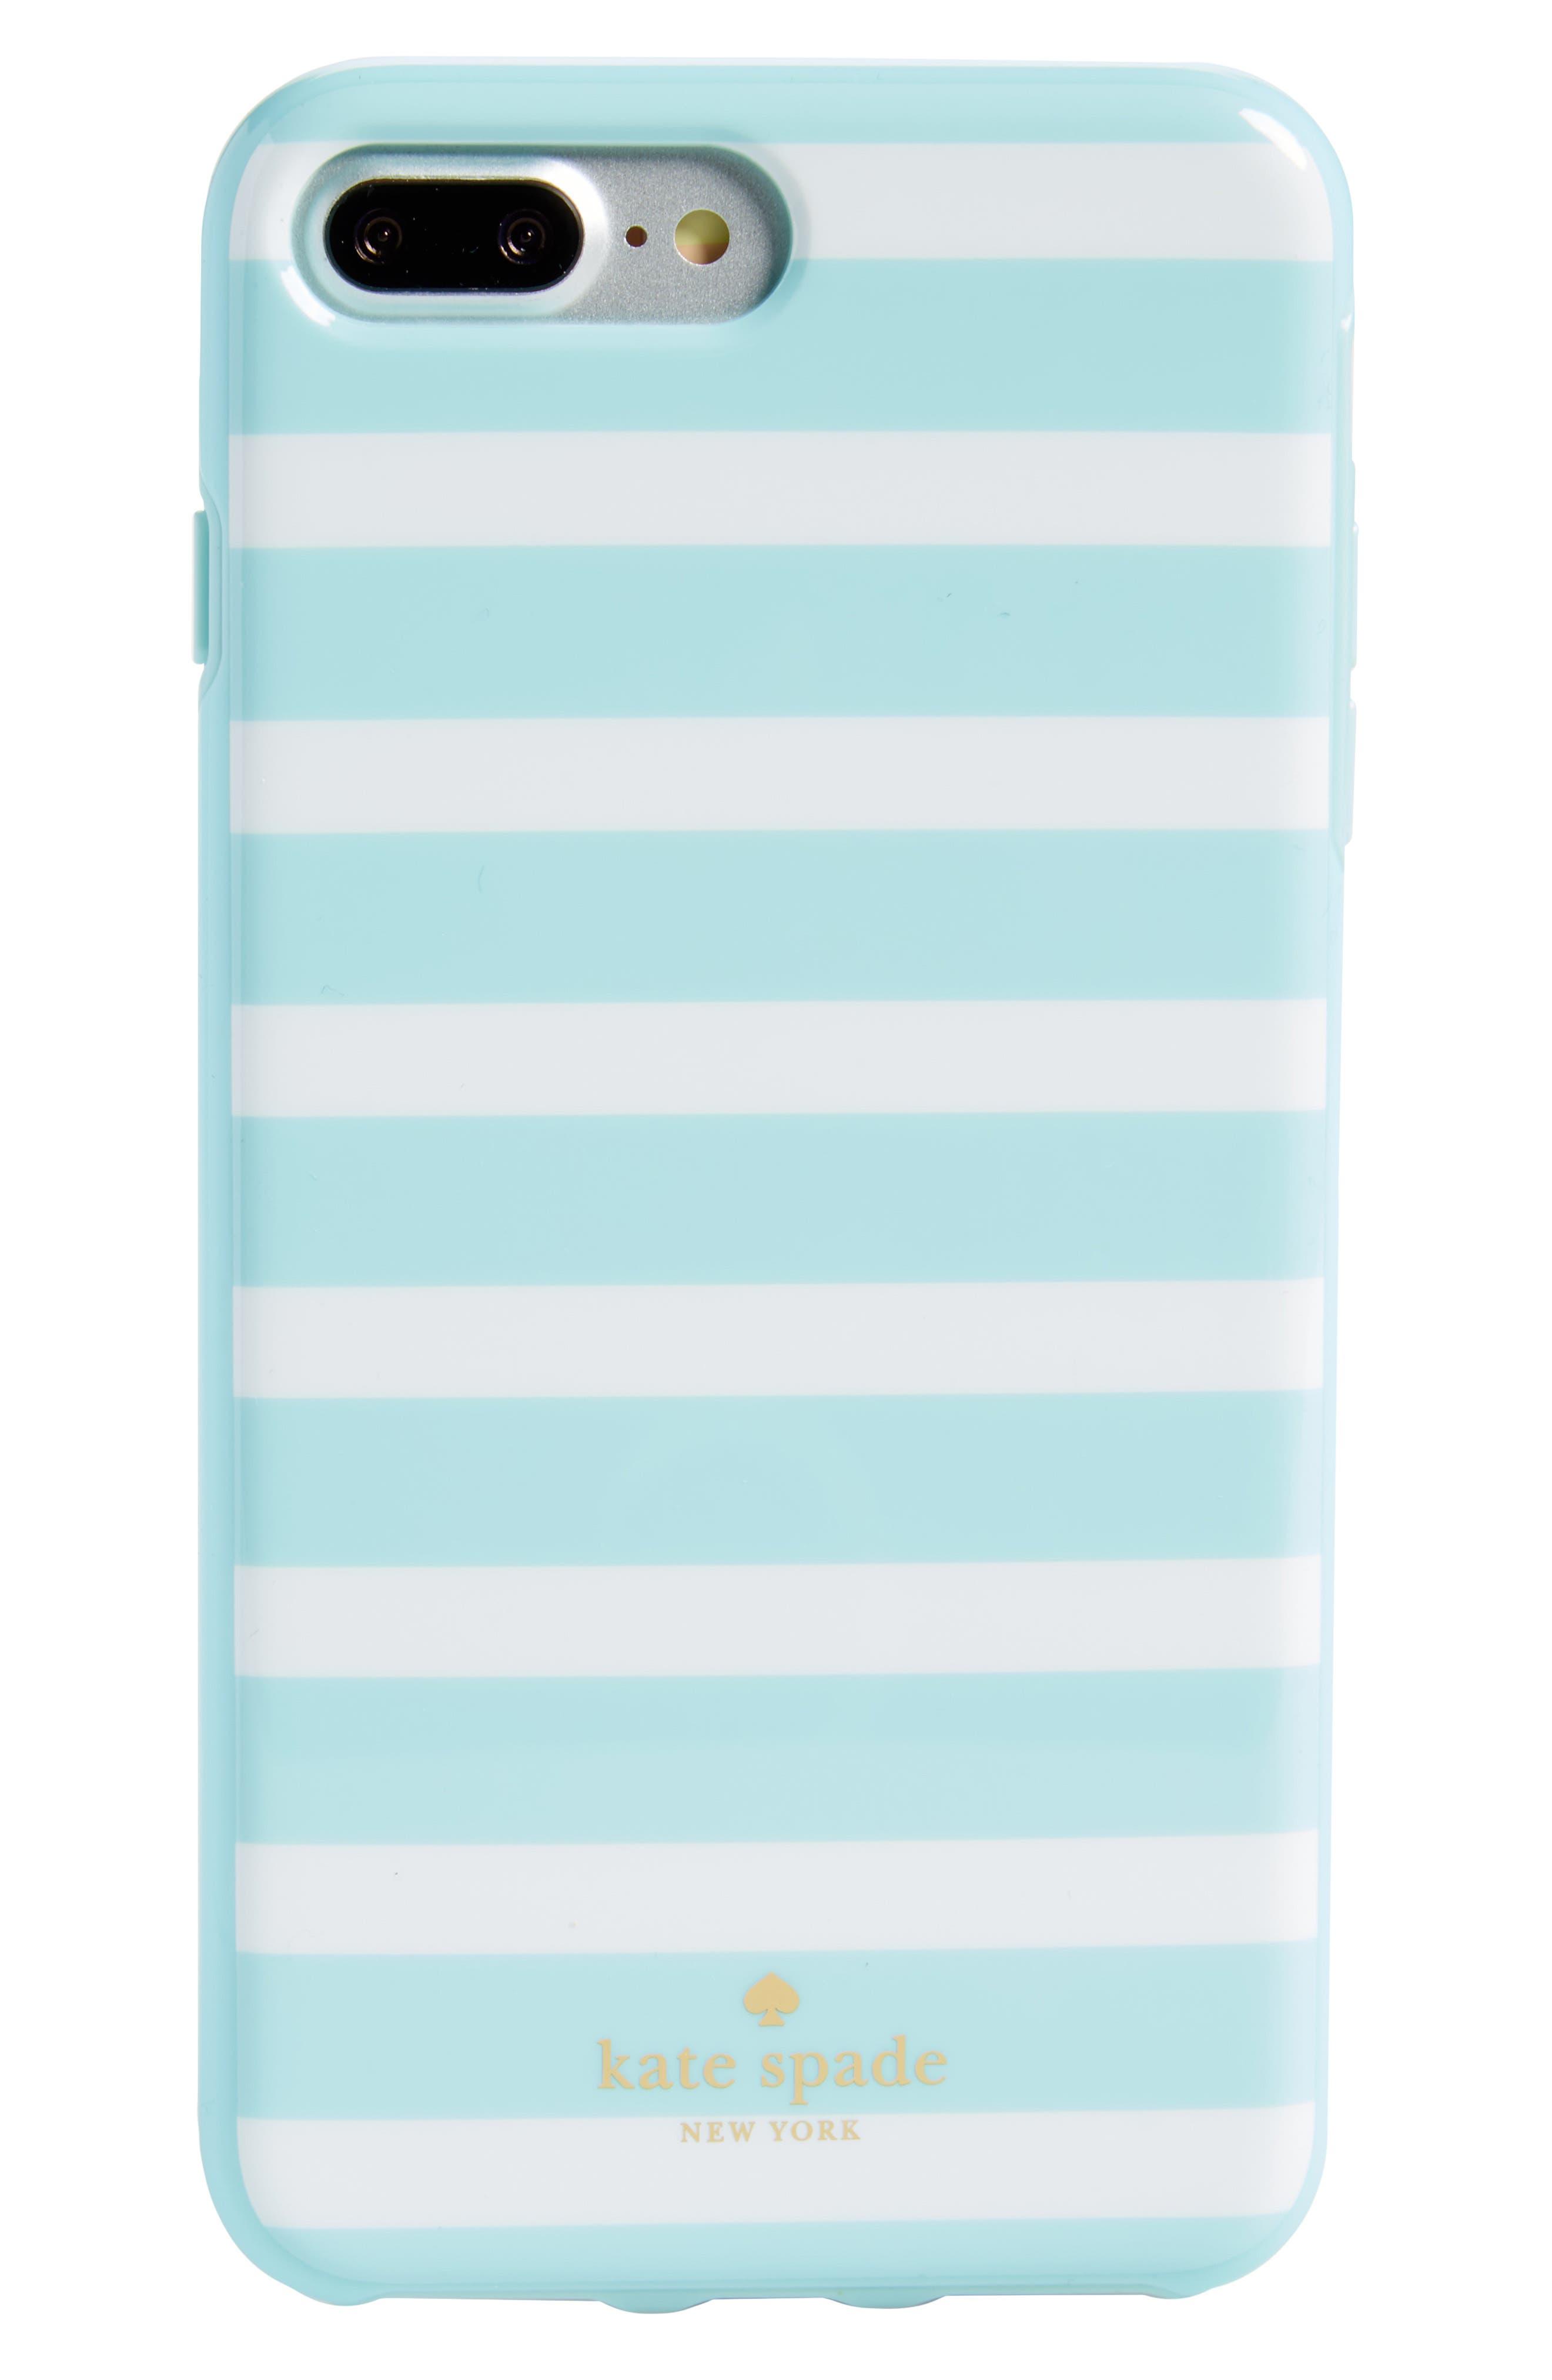 kate spade new york fairmount square stripe iPhone 6/7 & 6/7 Plus Case